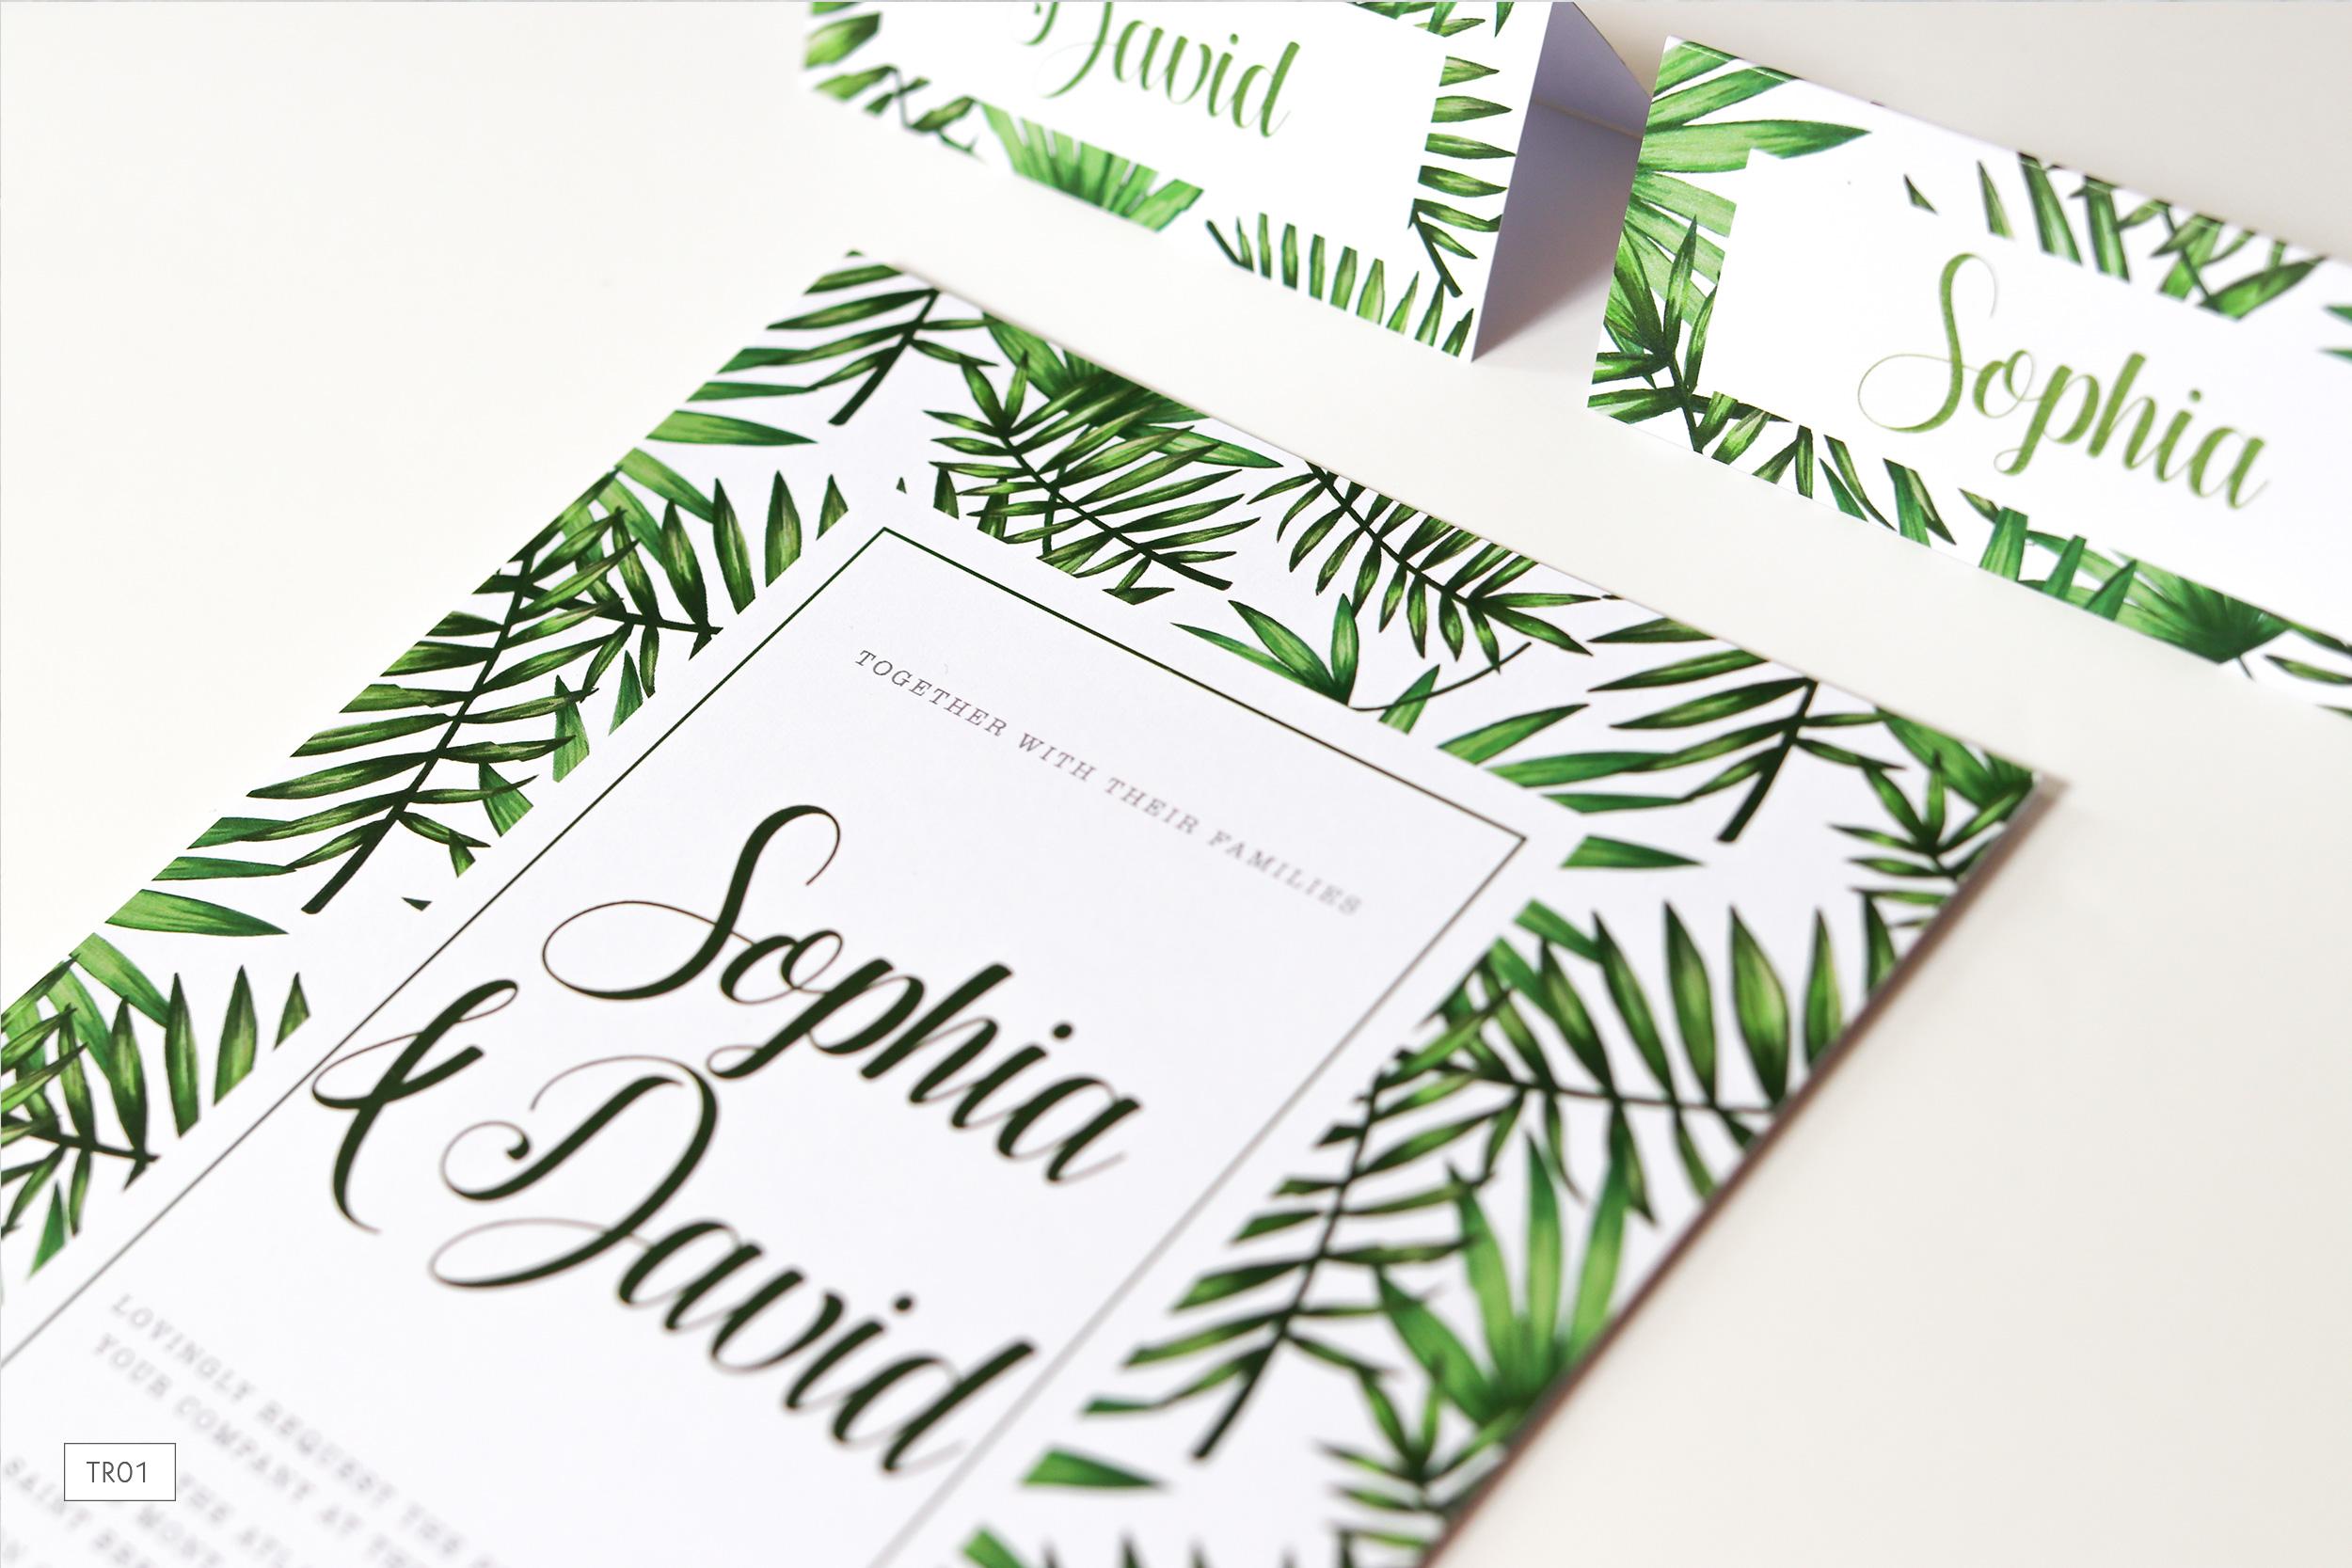 tropics-weddinginvitation-placecards.jpg